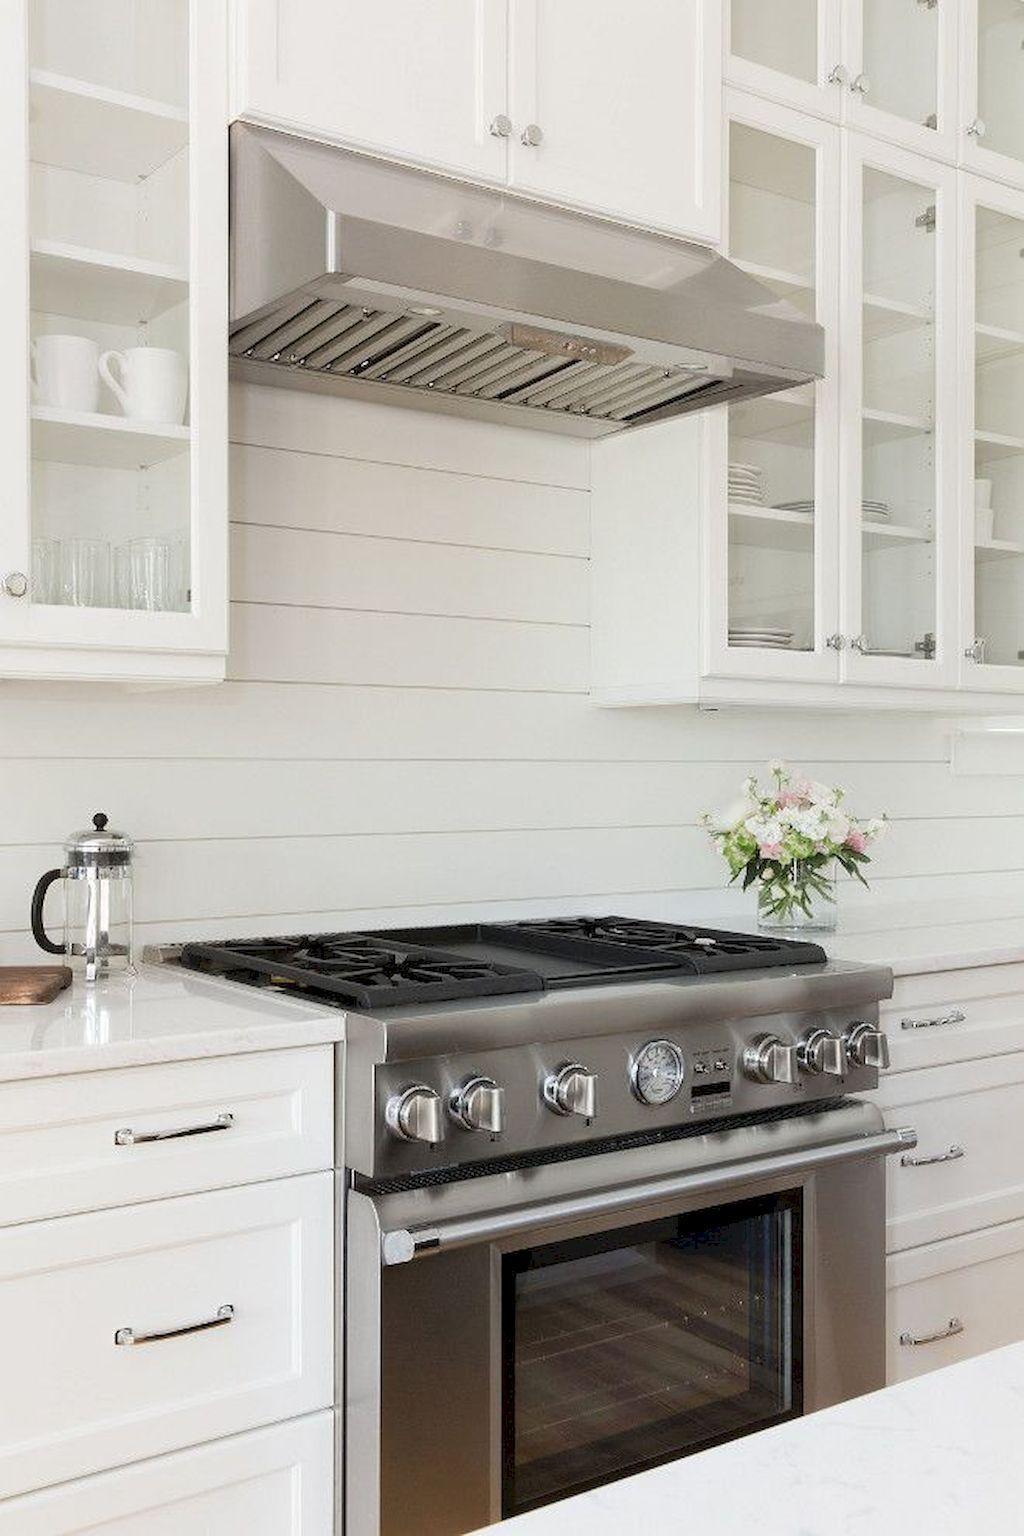 27 fetching modern kitchen tile to transform your kitchen